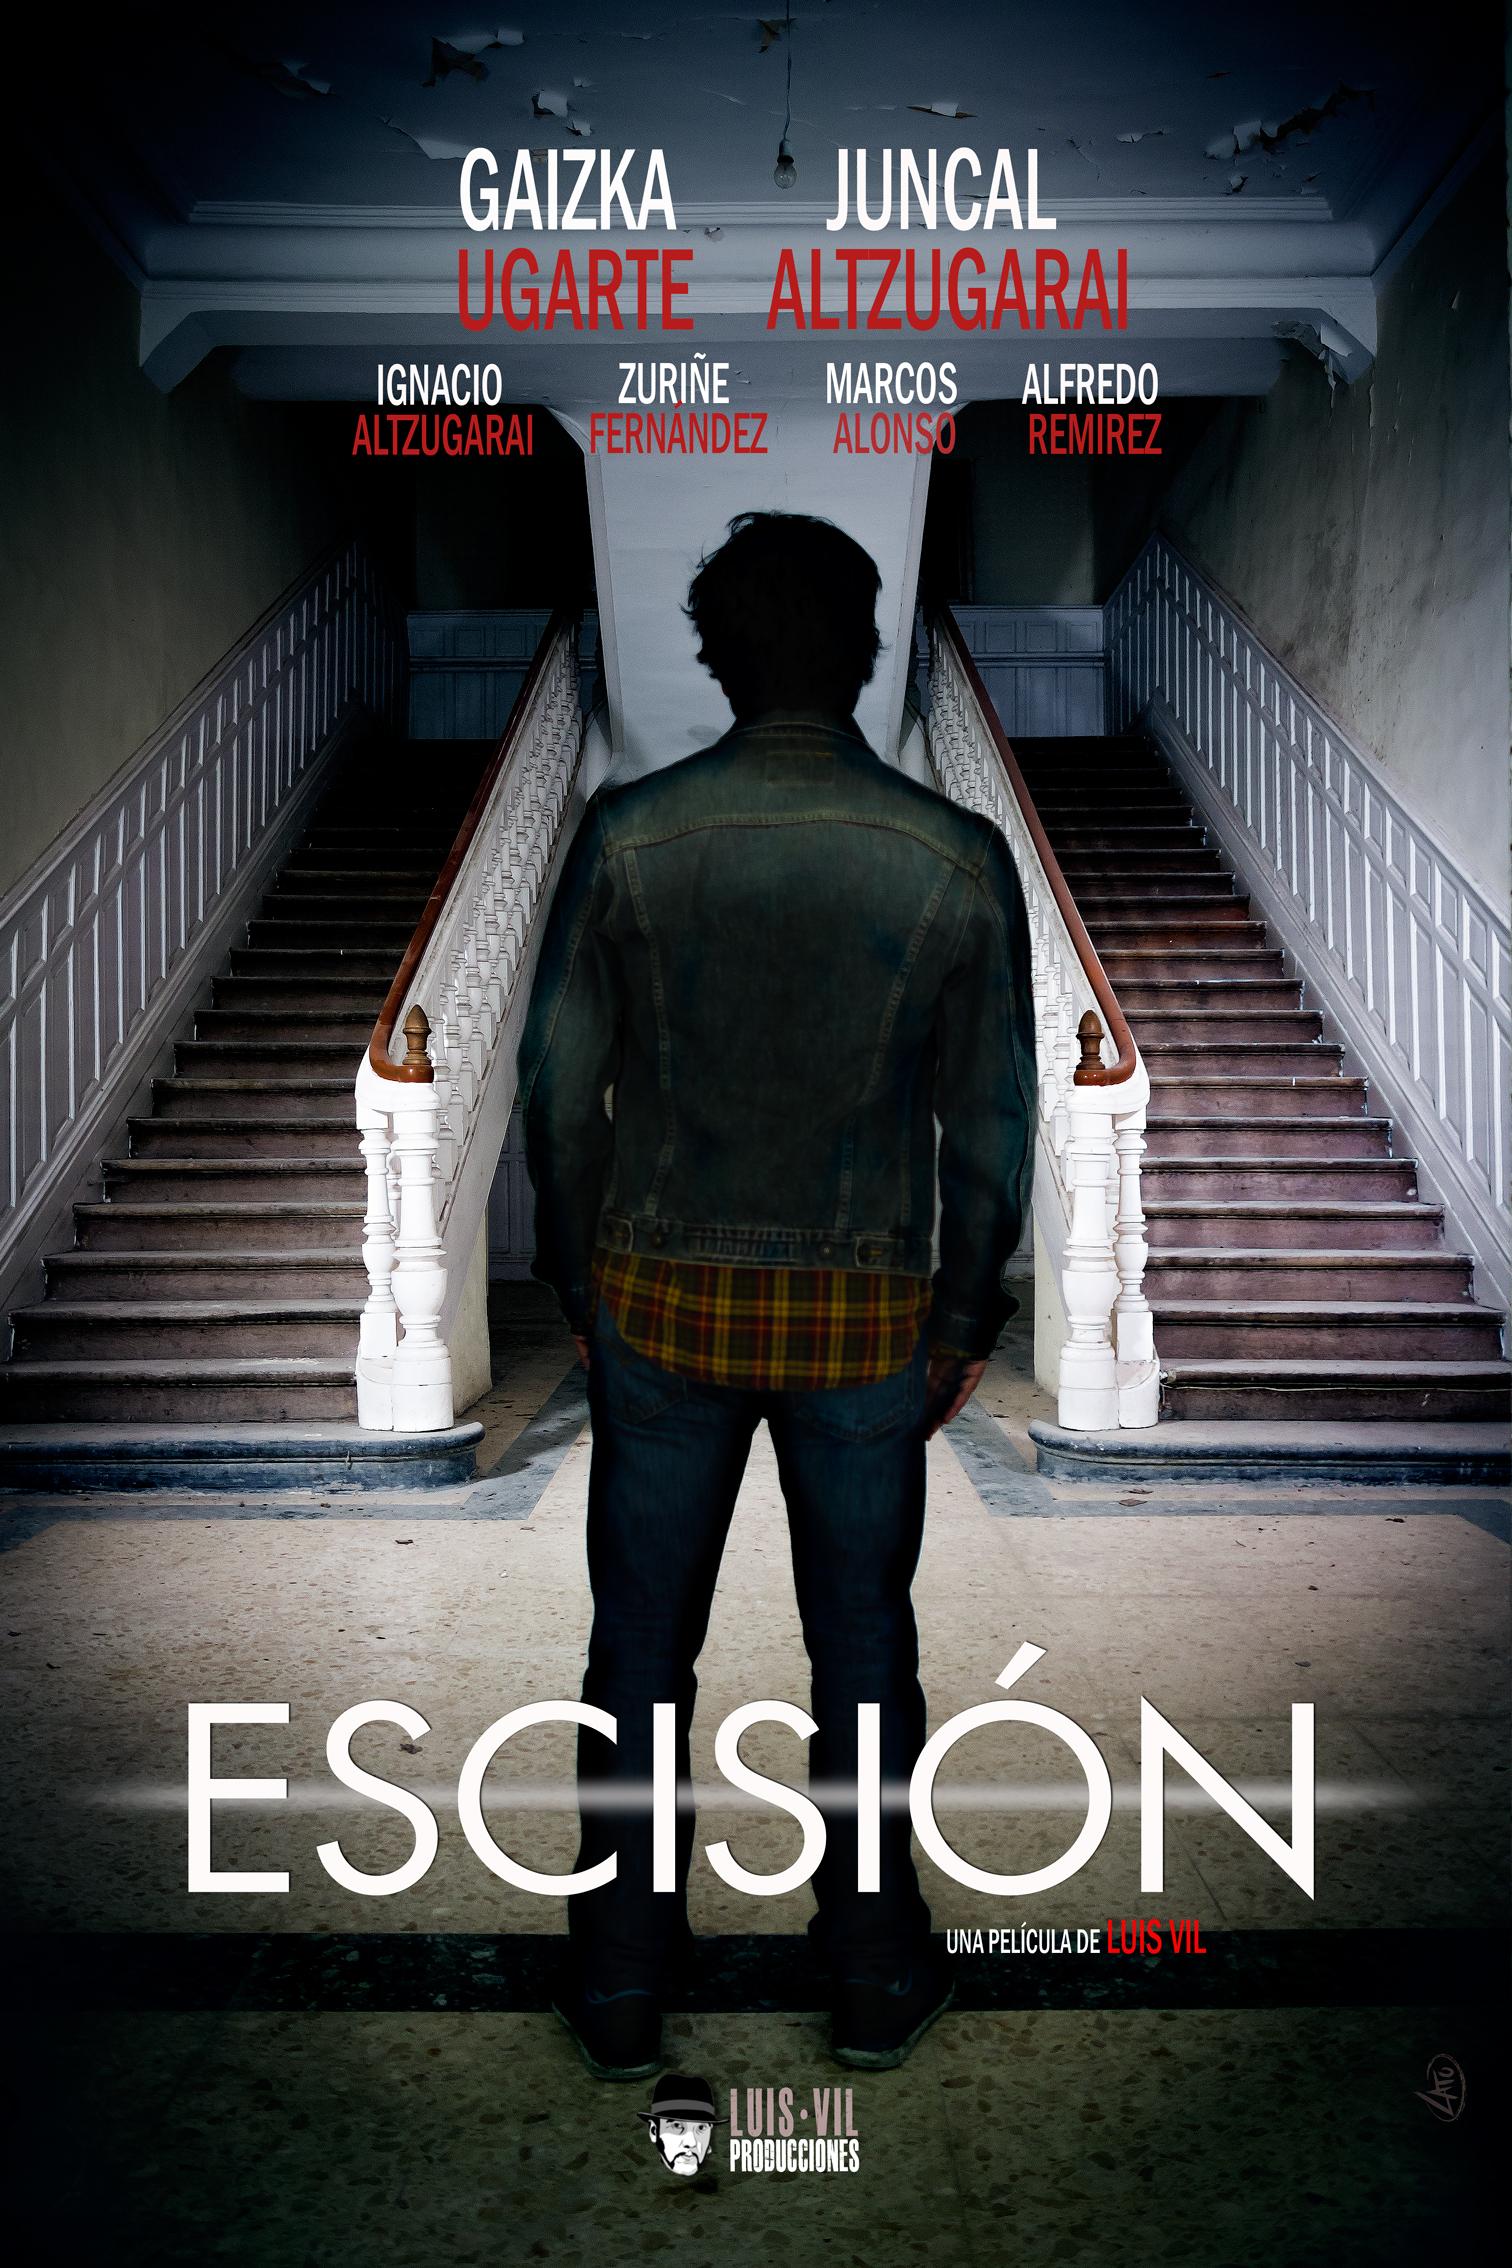 Escisión